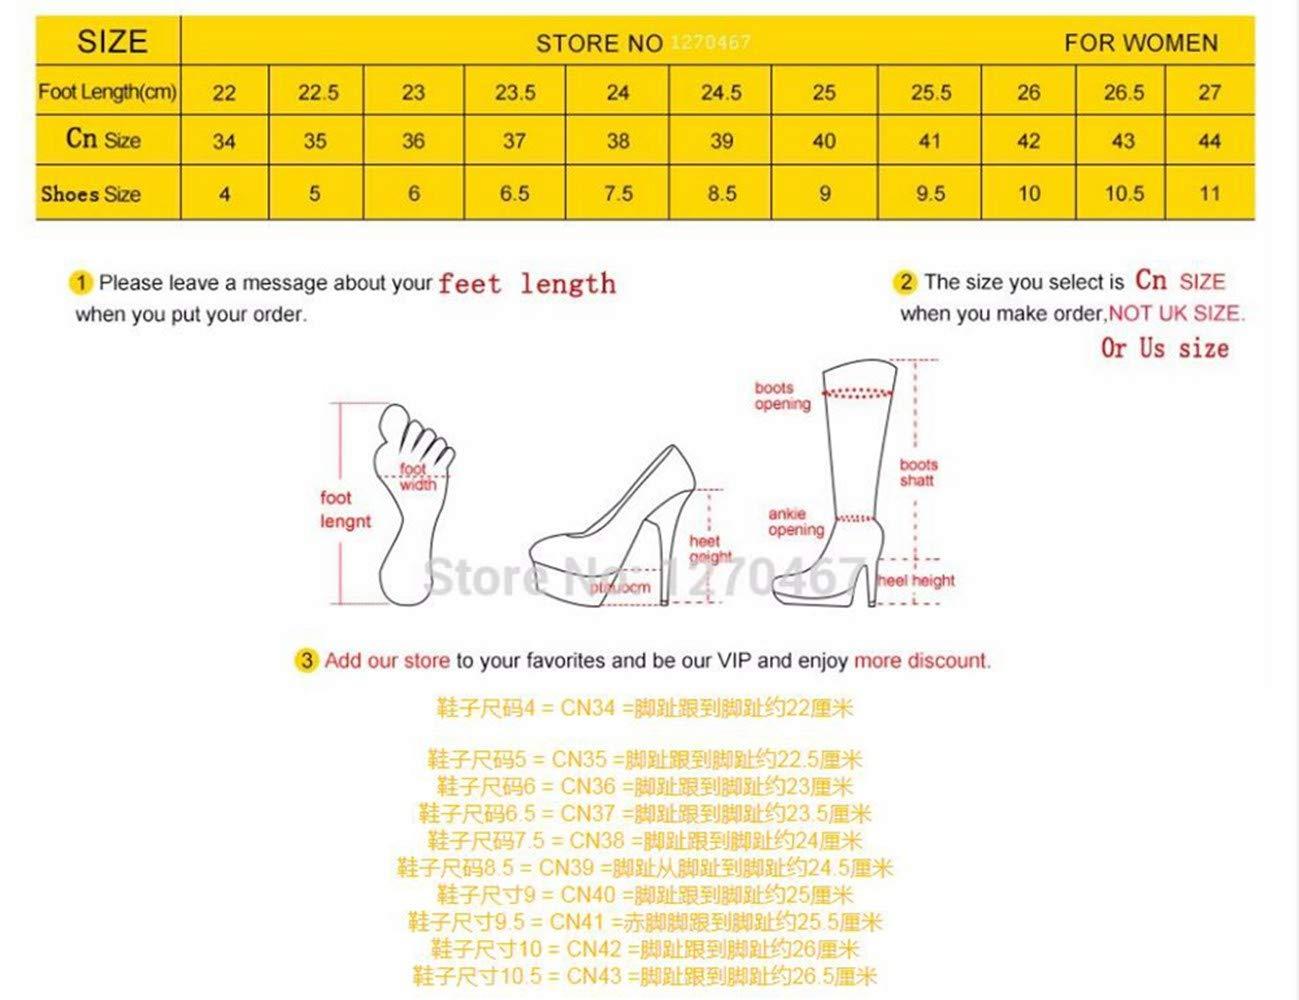 Ai Ya-xuezi Frauen Stiefel Pailletten High Heels Wedges Frühling Schuhe Herbst Ankle Stiefel Keile Heel Schuhe Frühling Damen Stiefel Größe 34-42 28af0d